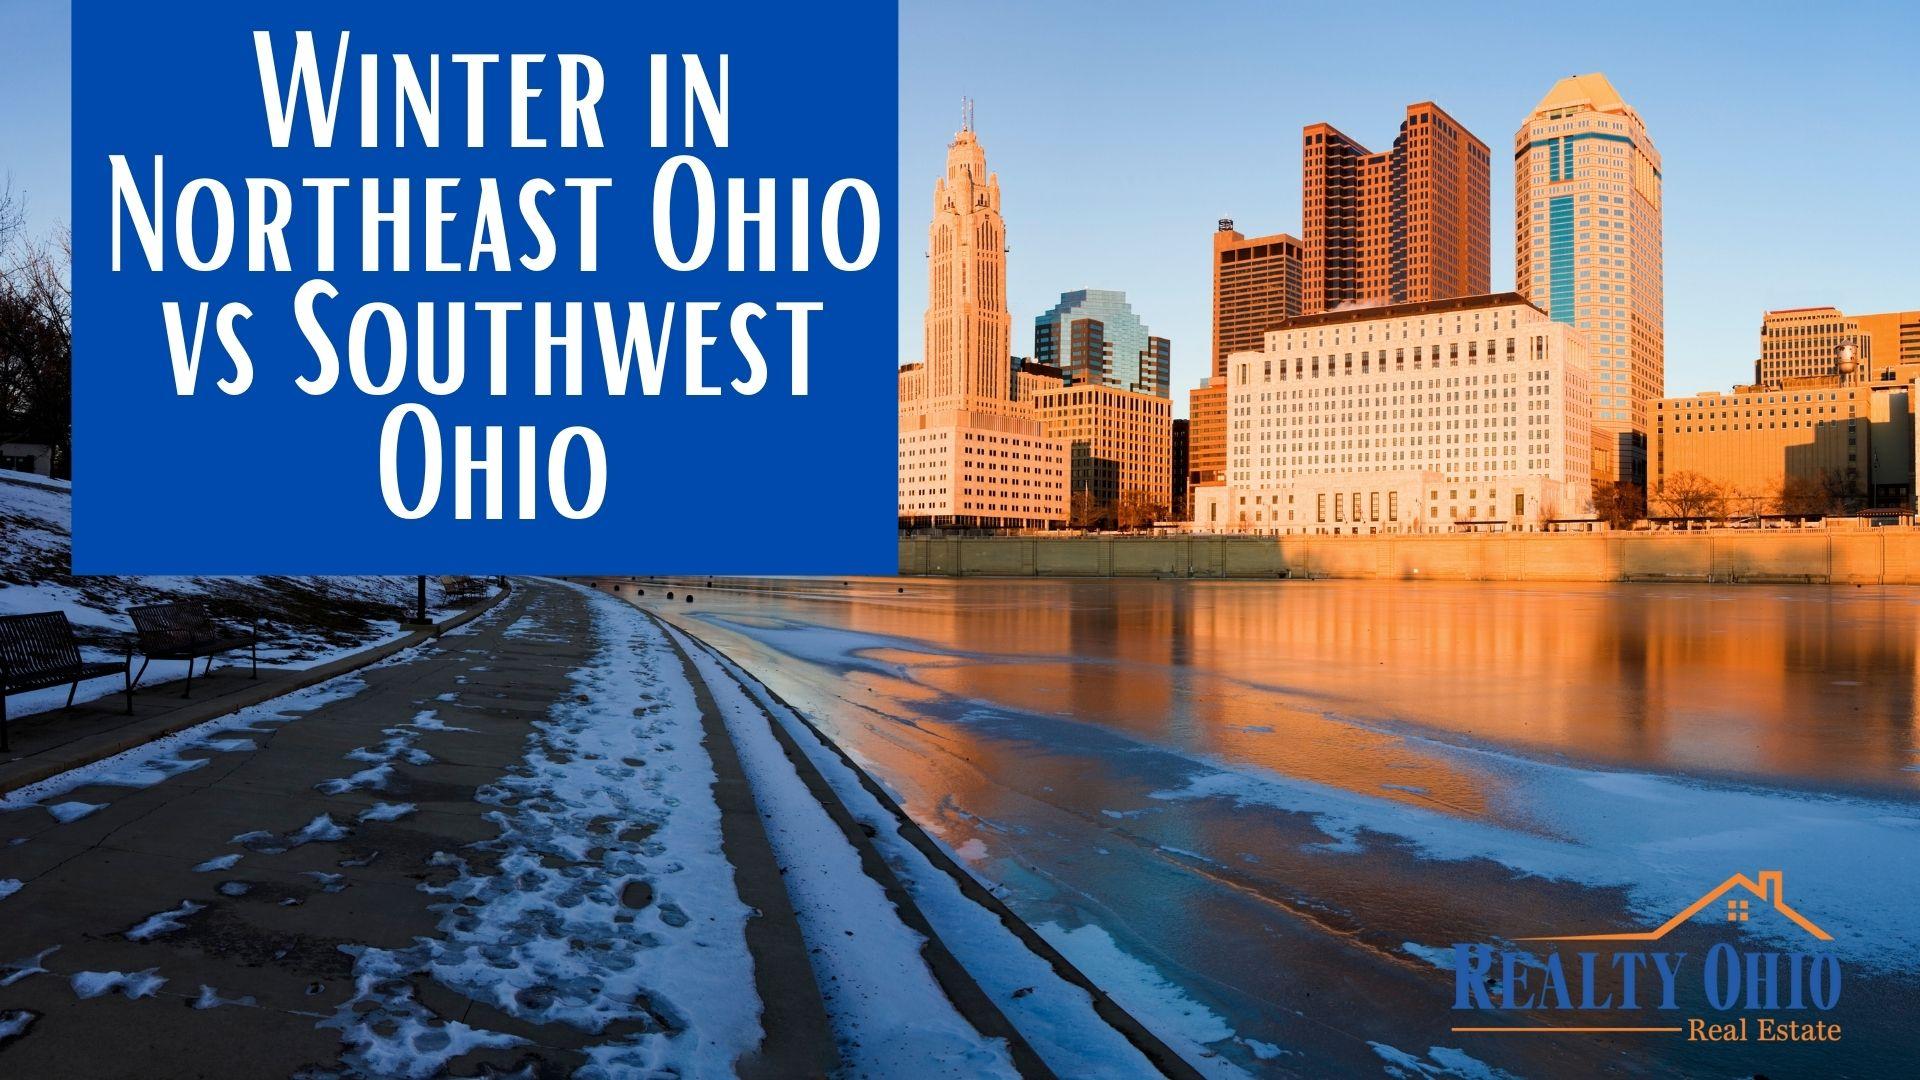 Winter in Northeast Ohio vs Southwest Ohio